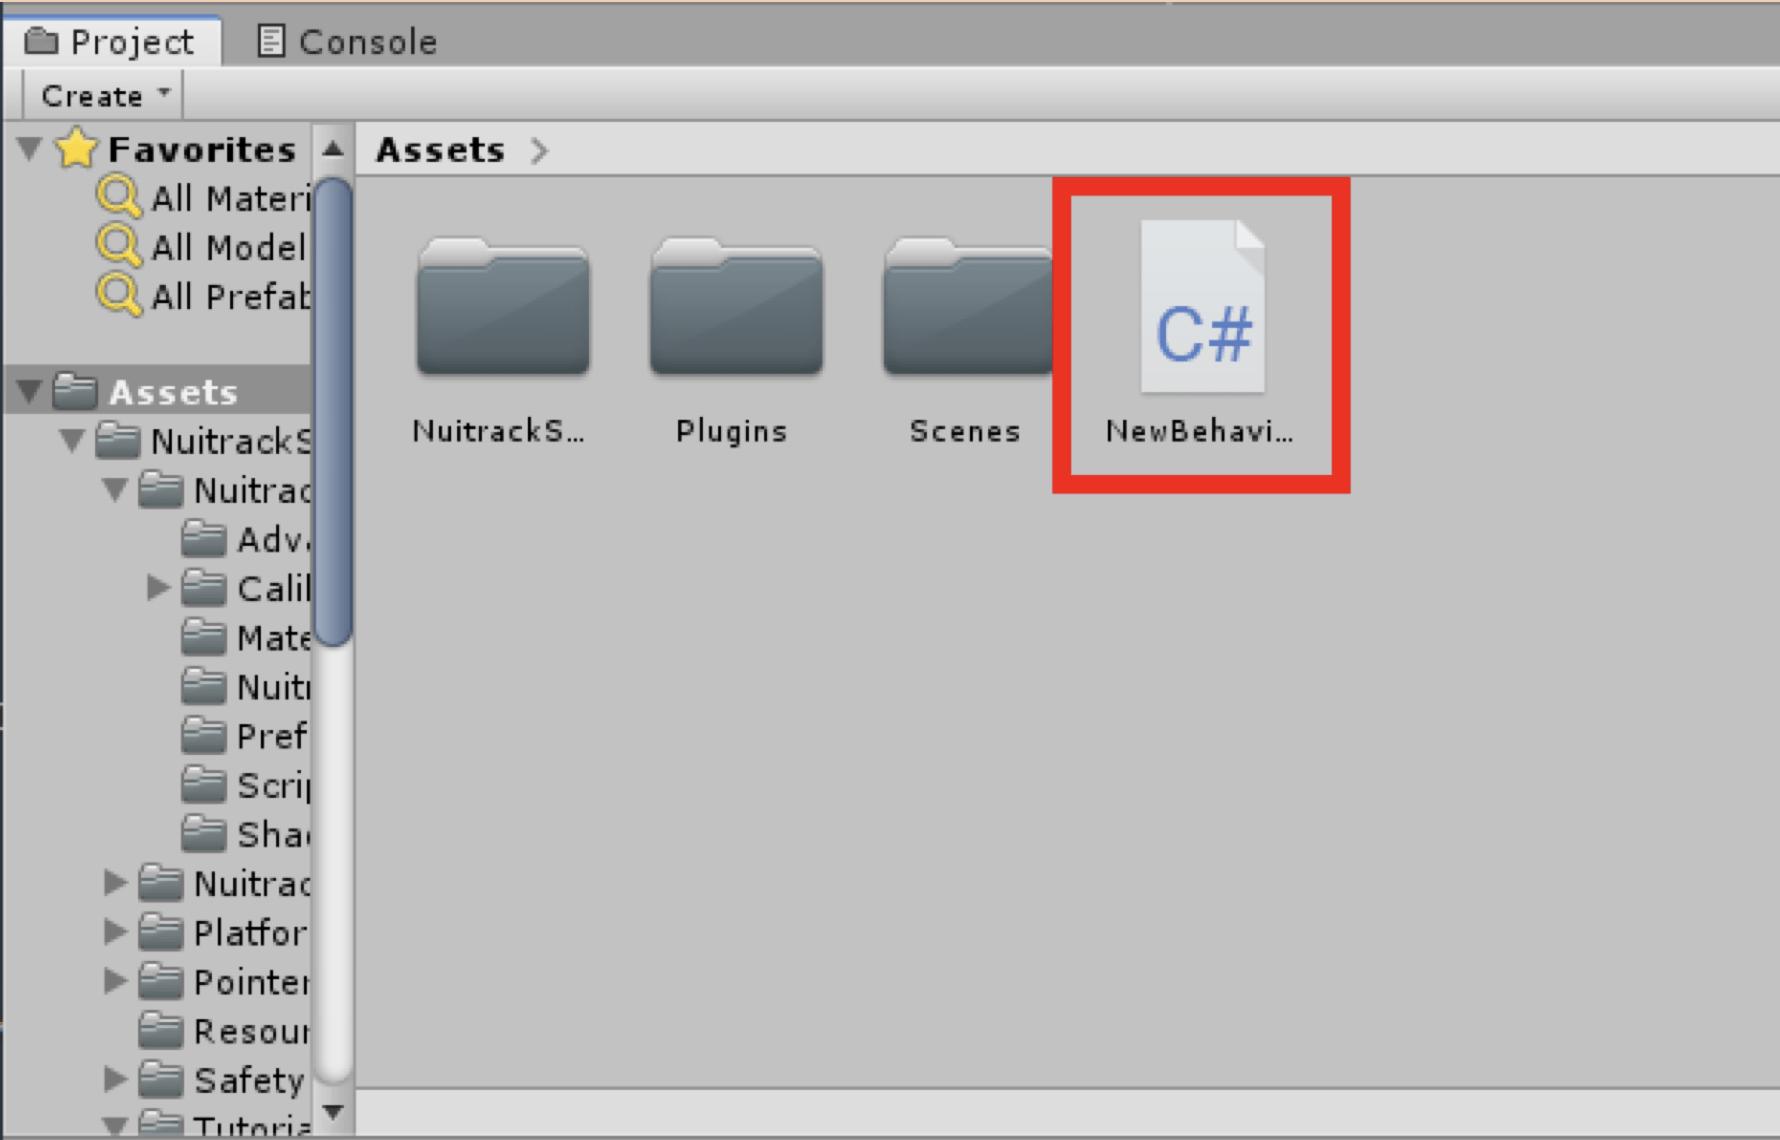 「Assets」内の階層にある、先ほど作成したスクリプトファイルを開いて編集する